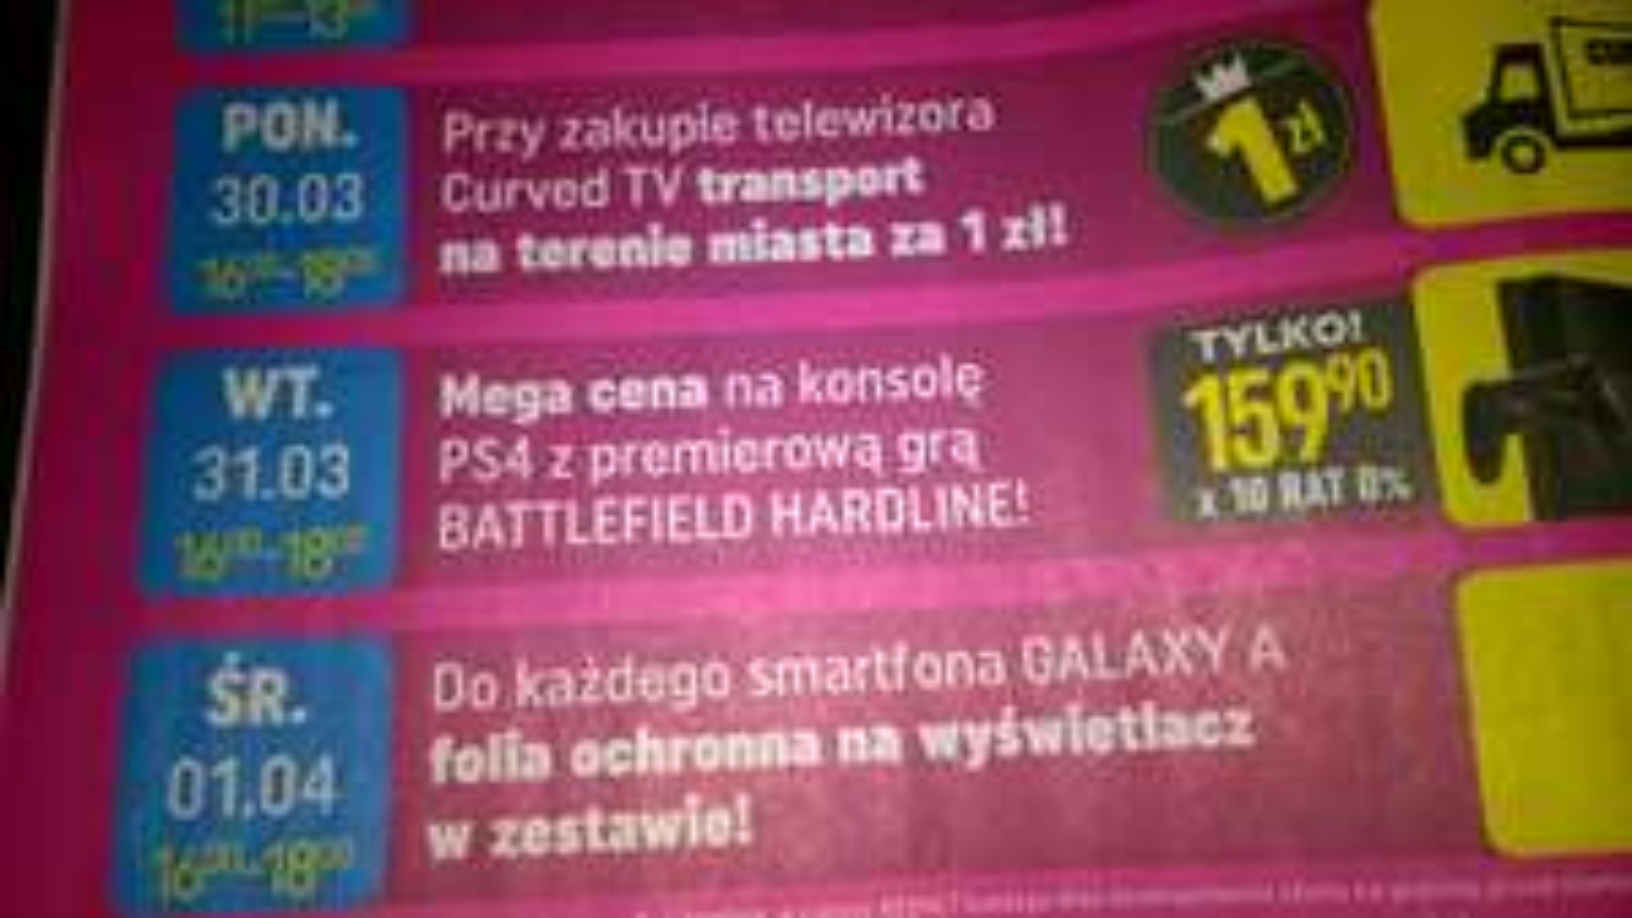 Happy Hours! PS4 + Battlefield Hardline za 1599zł @ Neonet